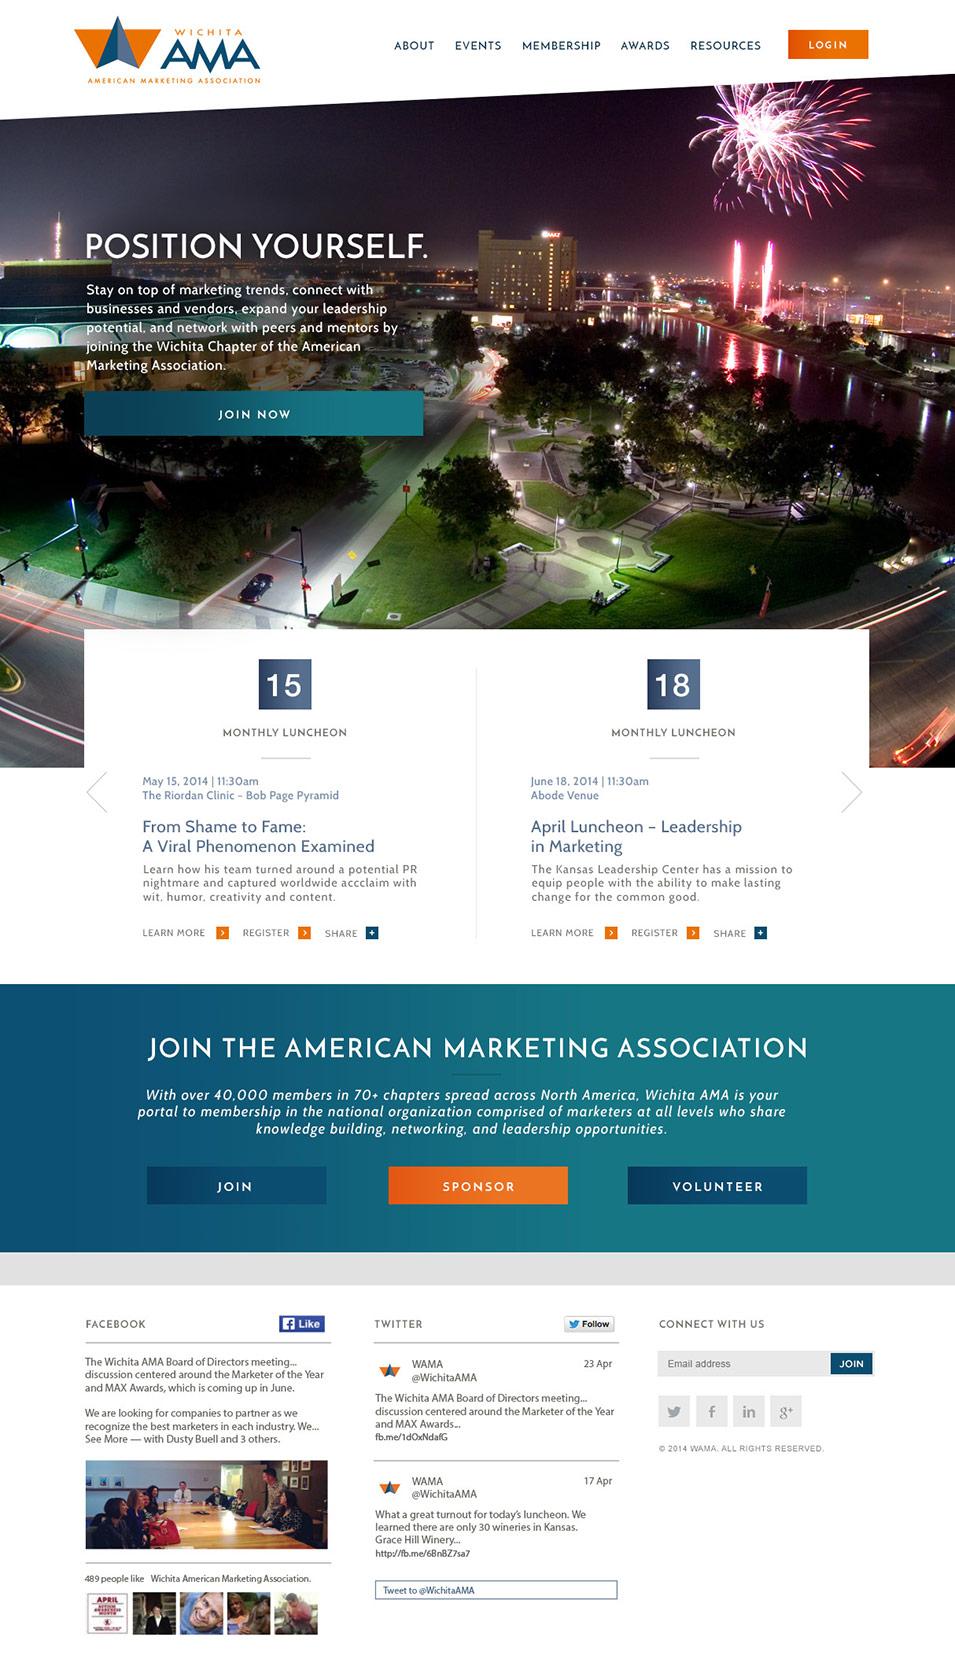 WAMA website design